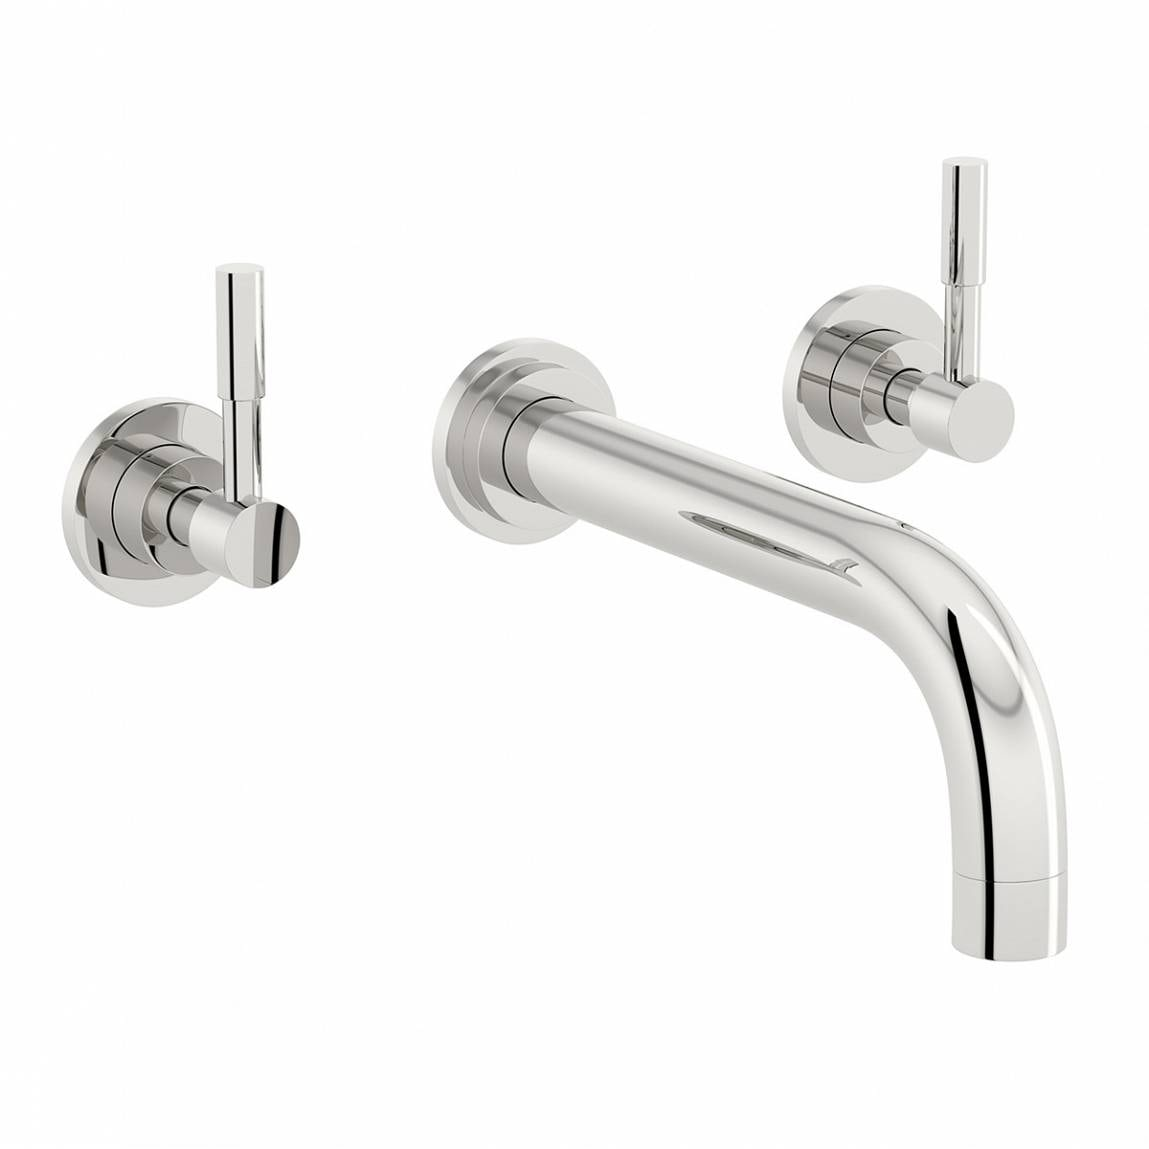 Secta wall mounted basin mixer tap